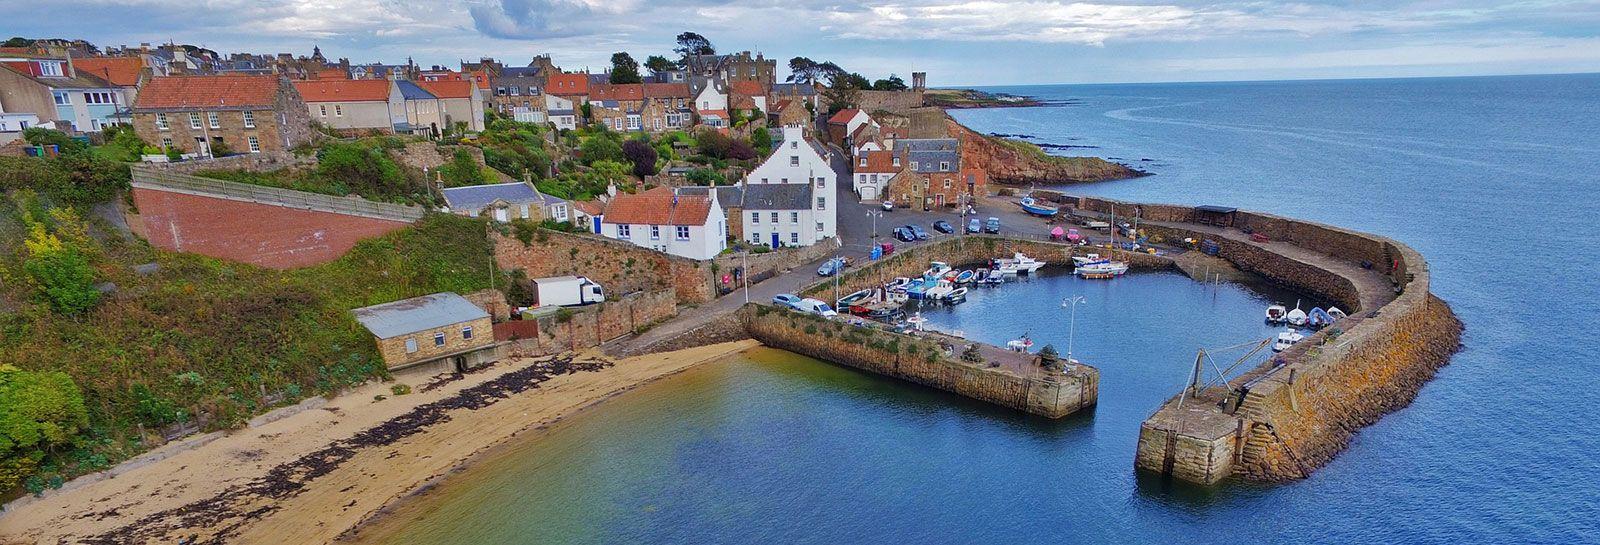 A coastal village in Scotland banner image